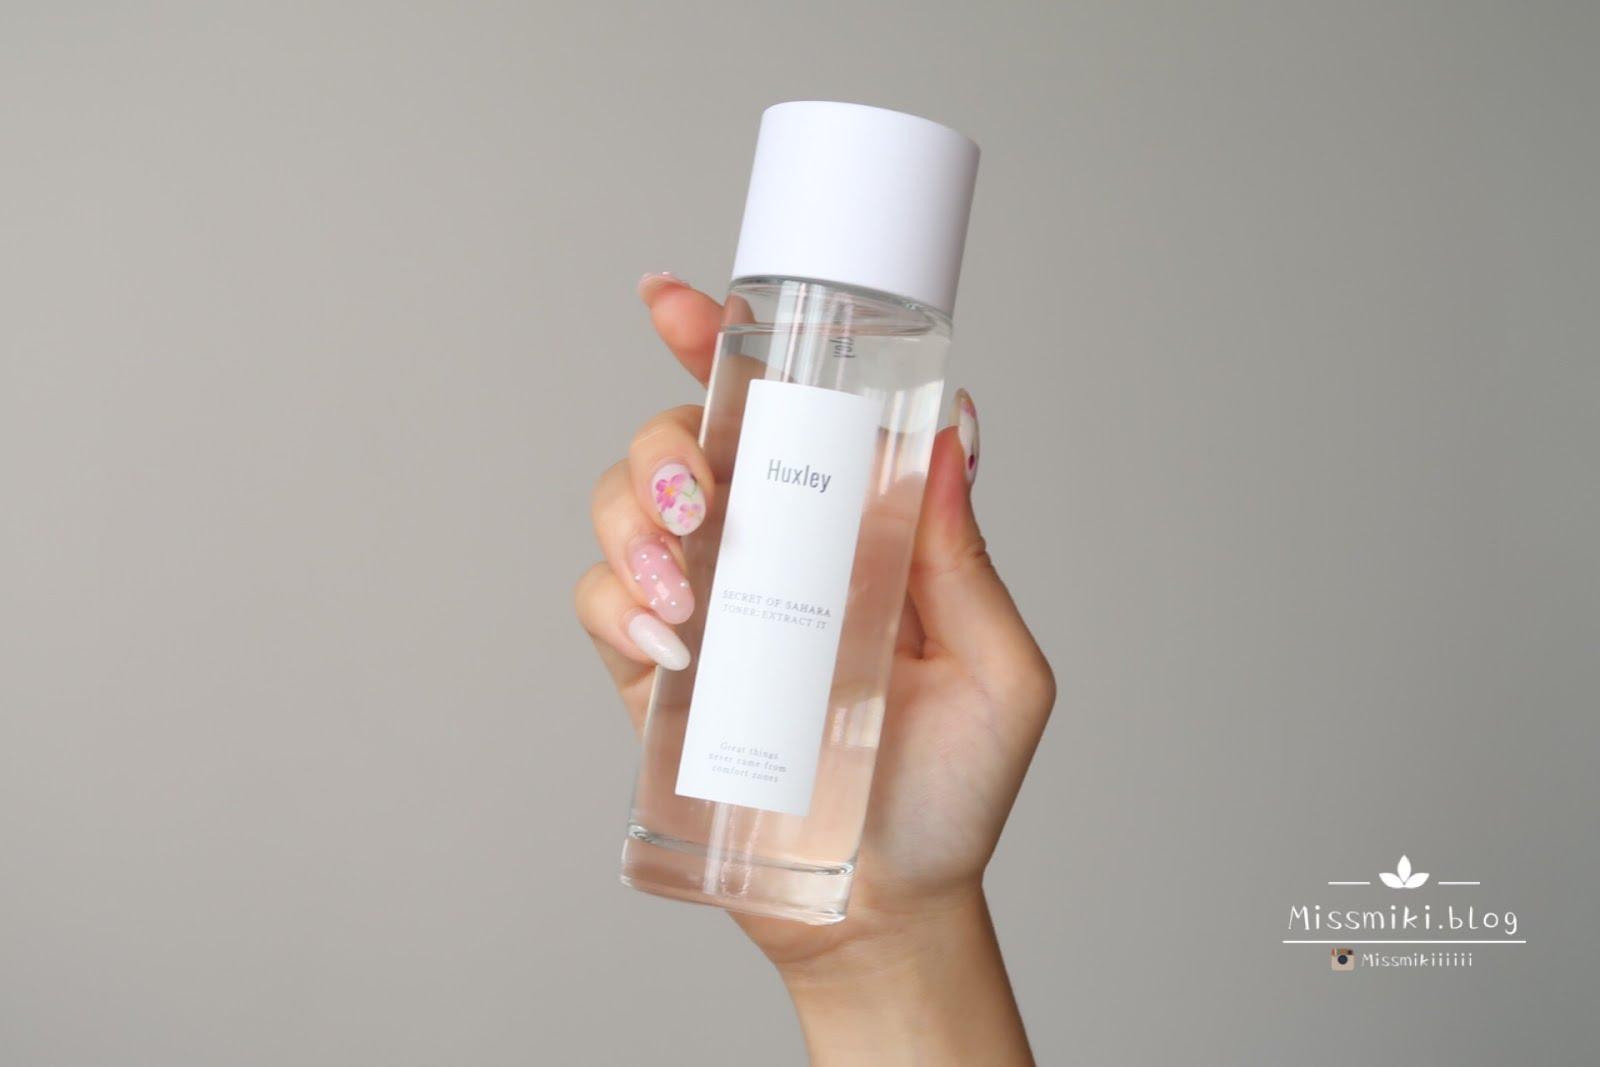 Beautylife Hk 仙人掌種子護膚品莎莎都有得賣韓國天然